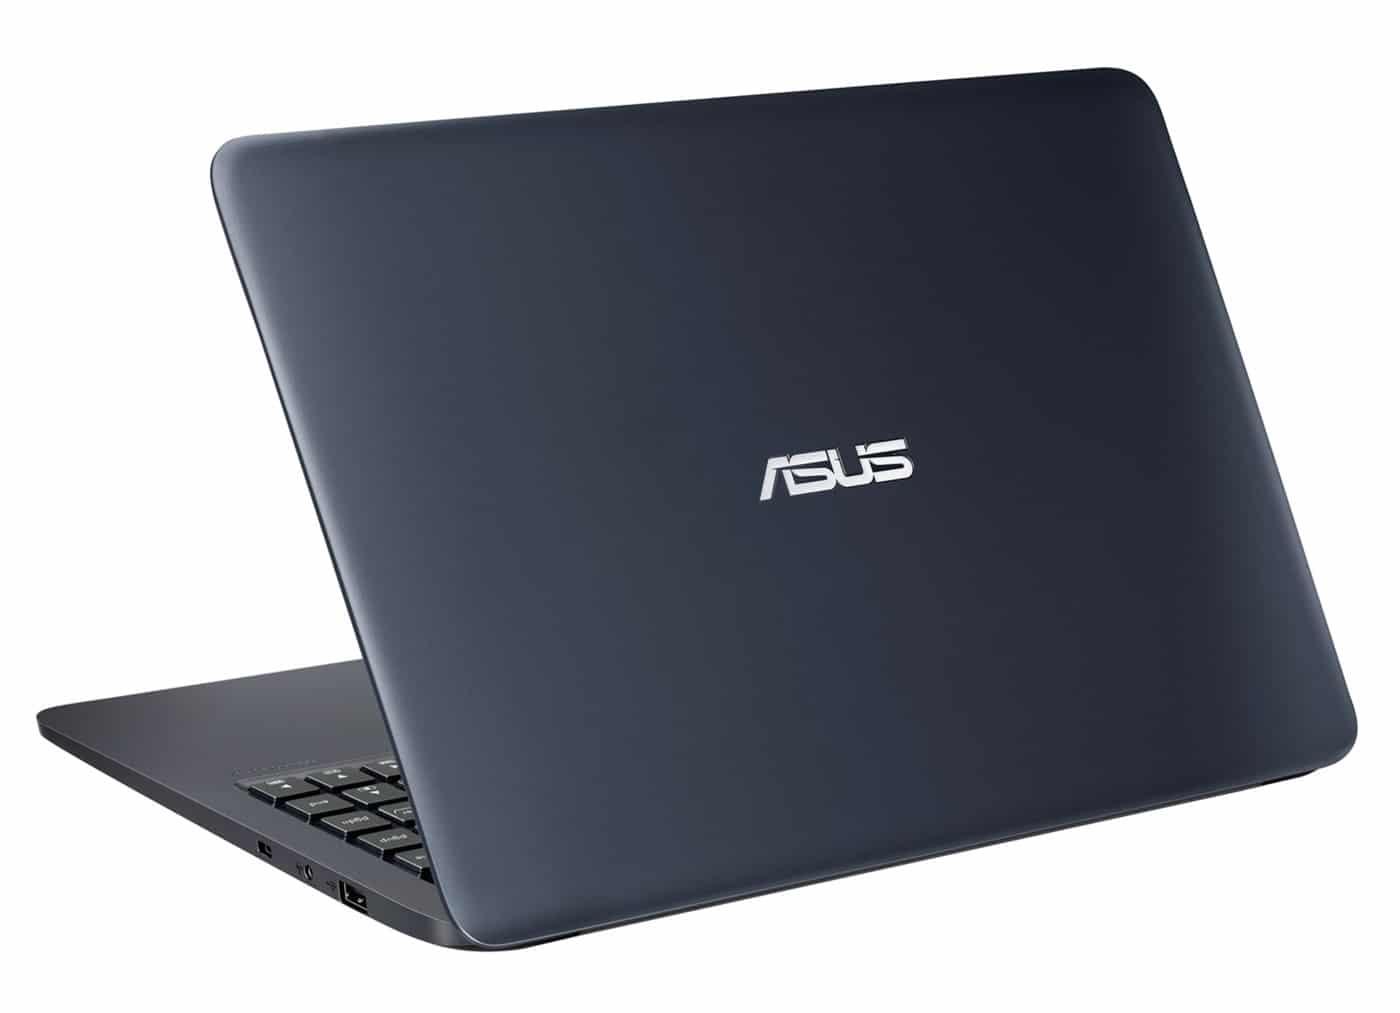 Asus EeeBook E402BA-FA042T, PC portable 14 pouces Full HD SSD 256 Go à 449€